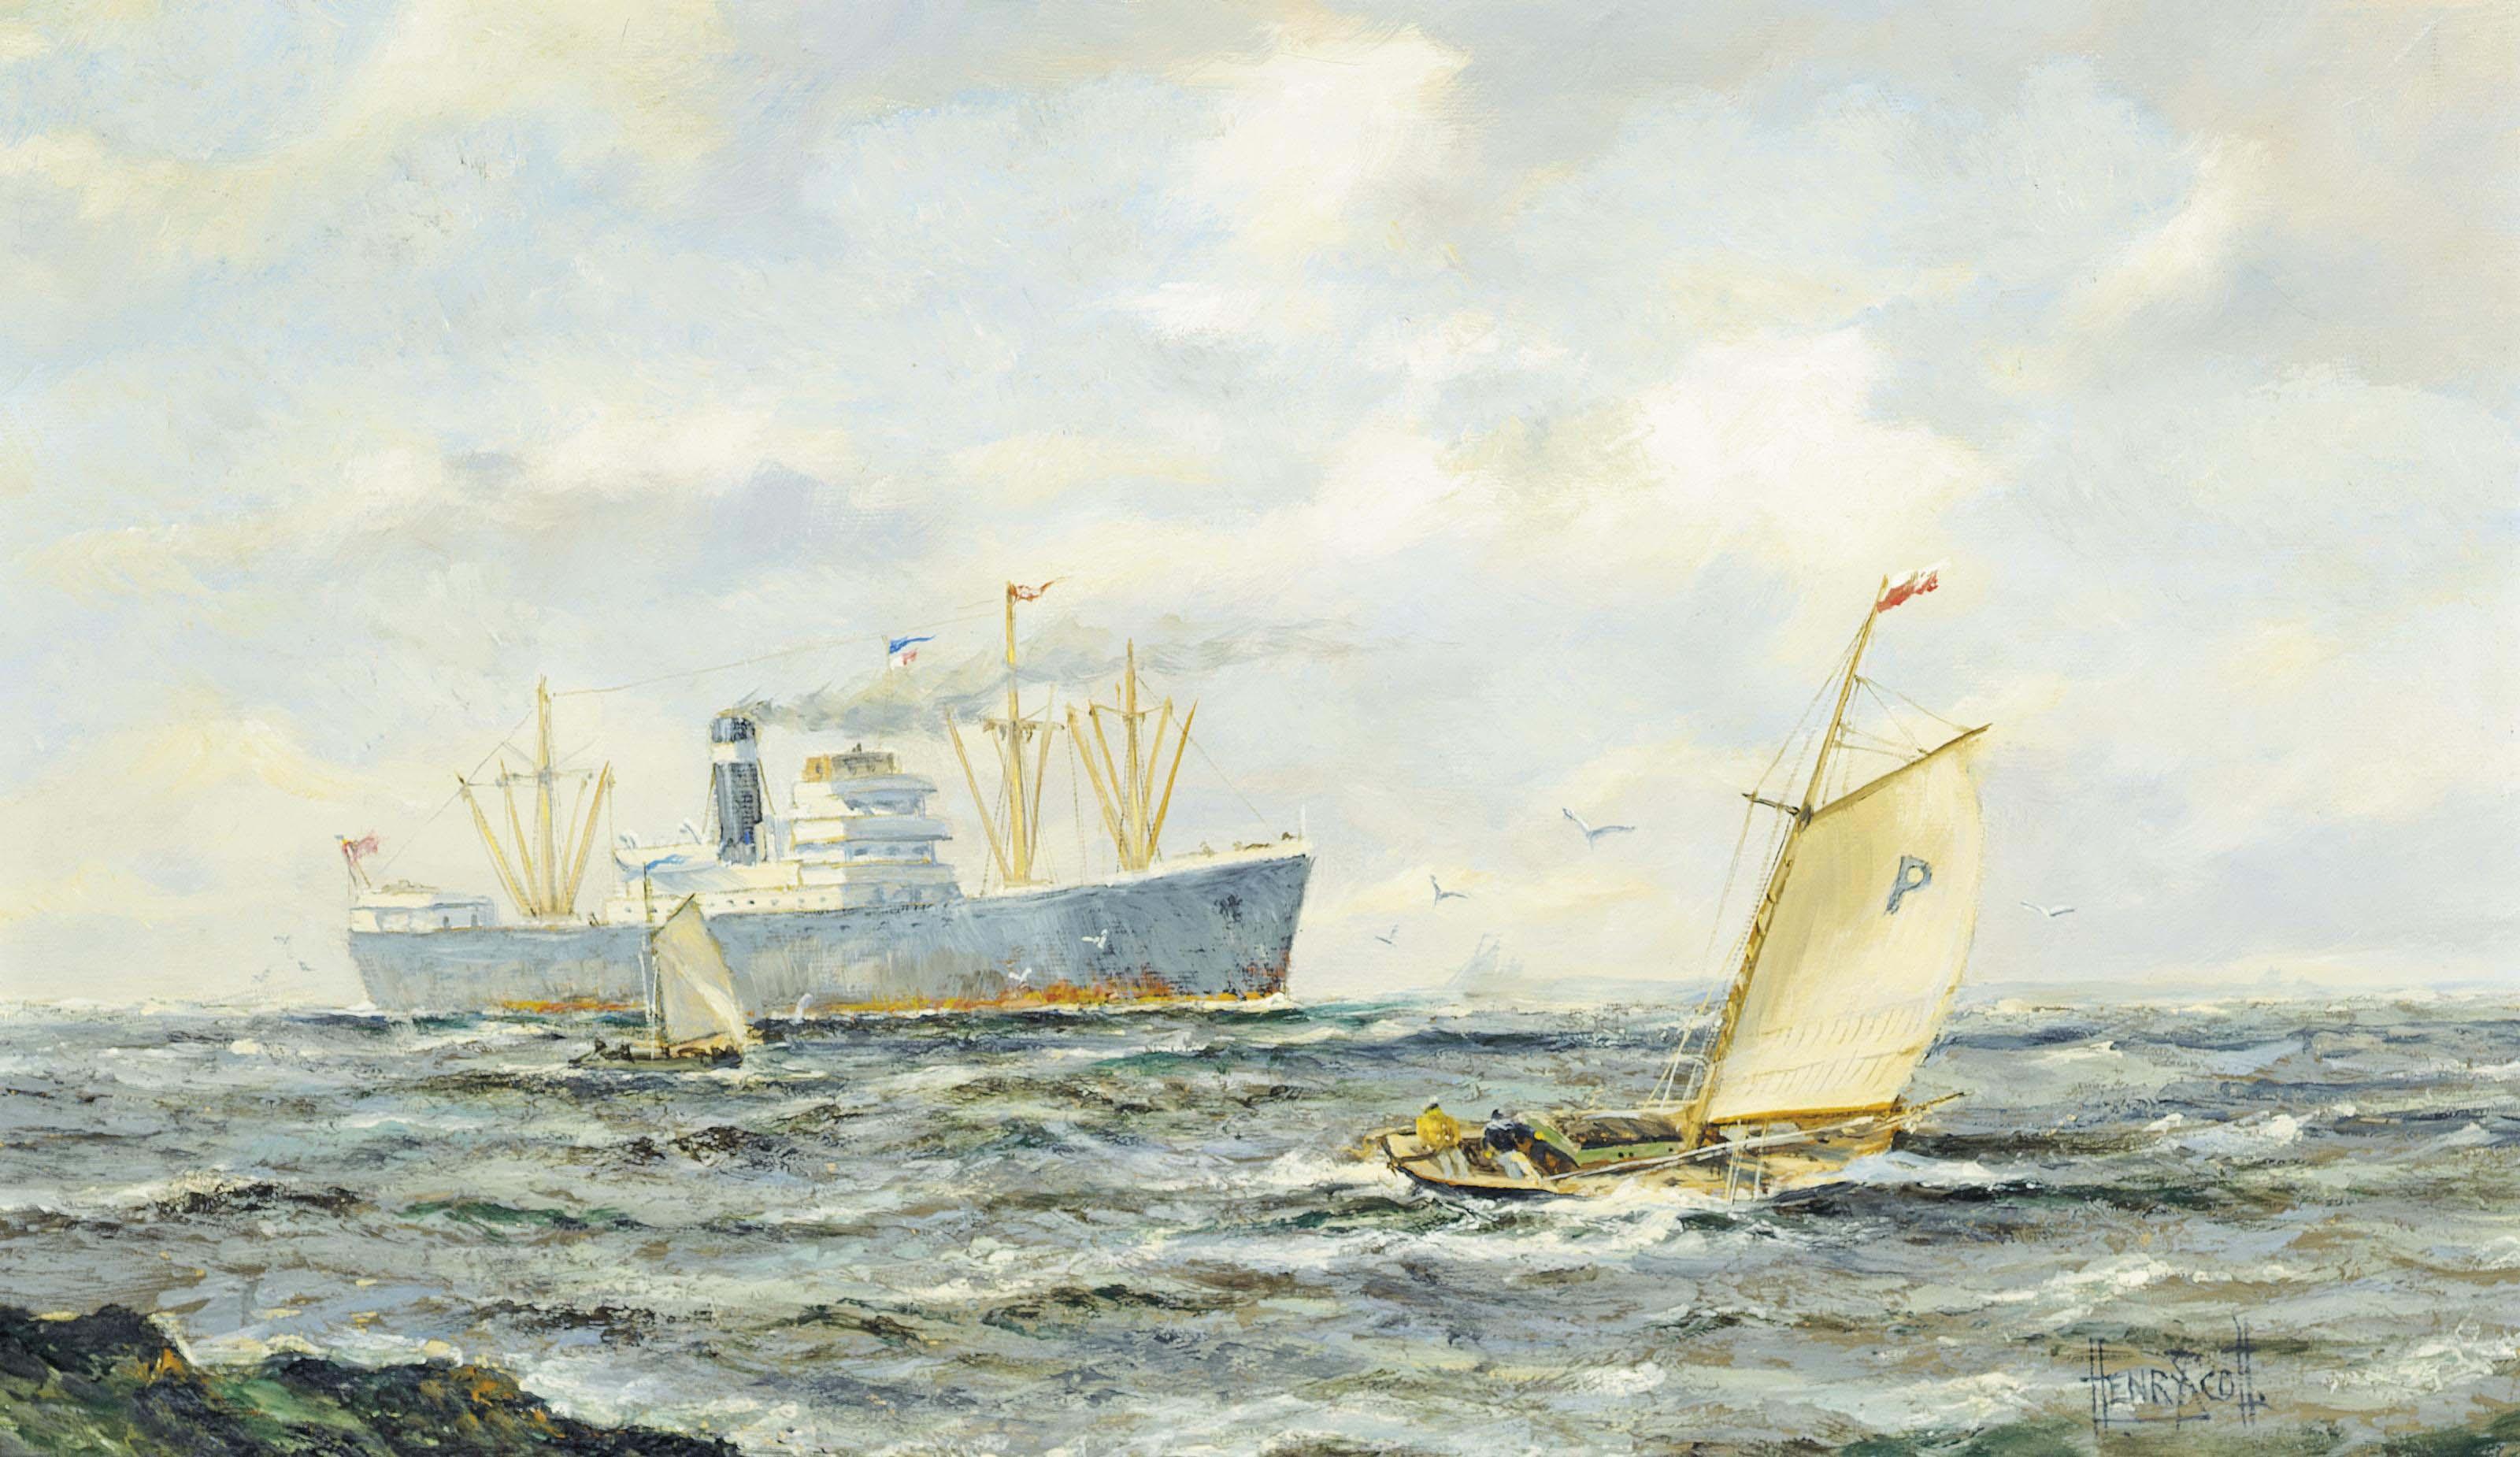 'Cargos from lands afar'